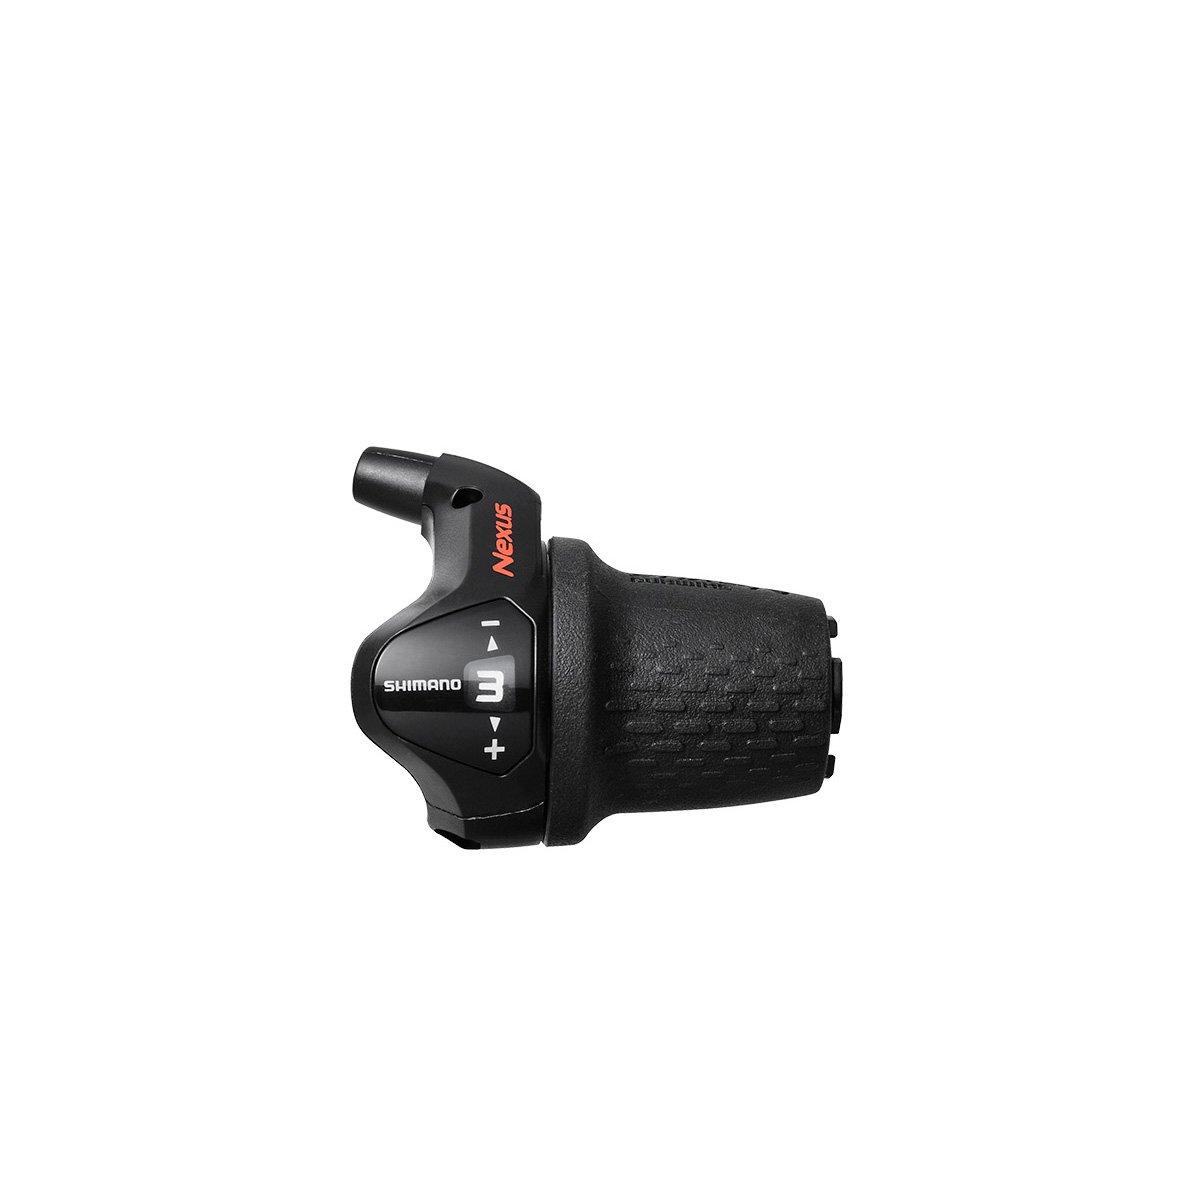 Gear shifter RevoShift SL-3S42 Nexus 3s with bell crank SHIMANO bike